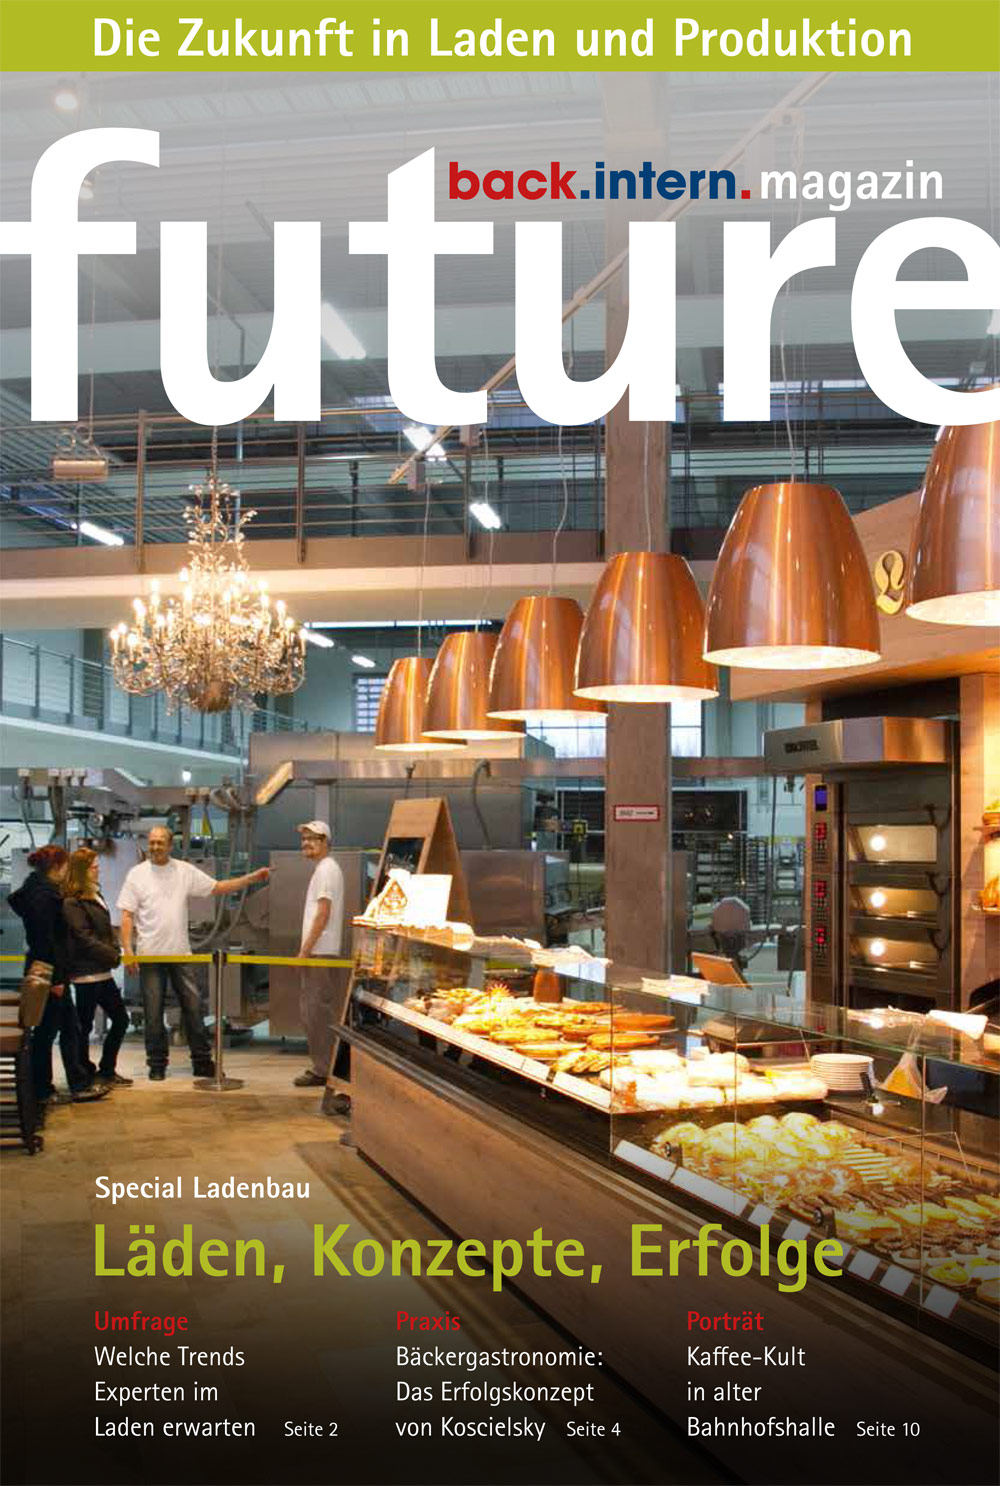 back.intern. future 01/2015 Ladenbau